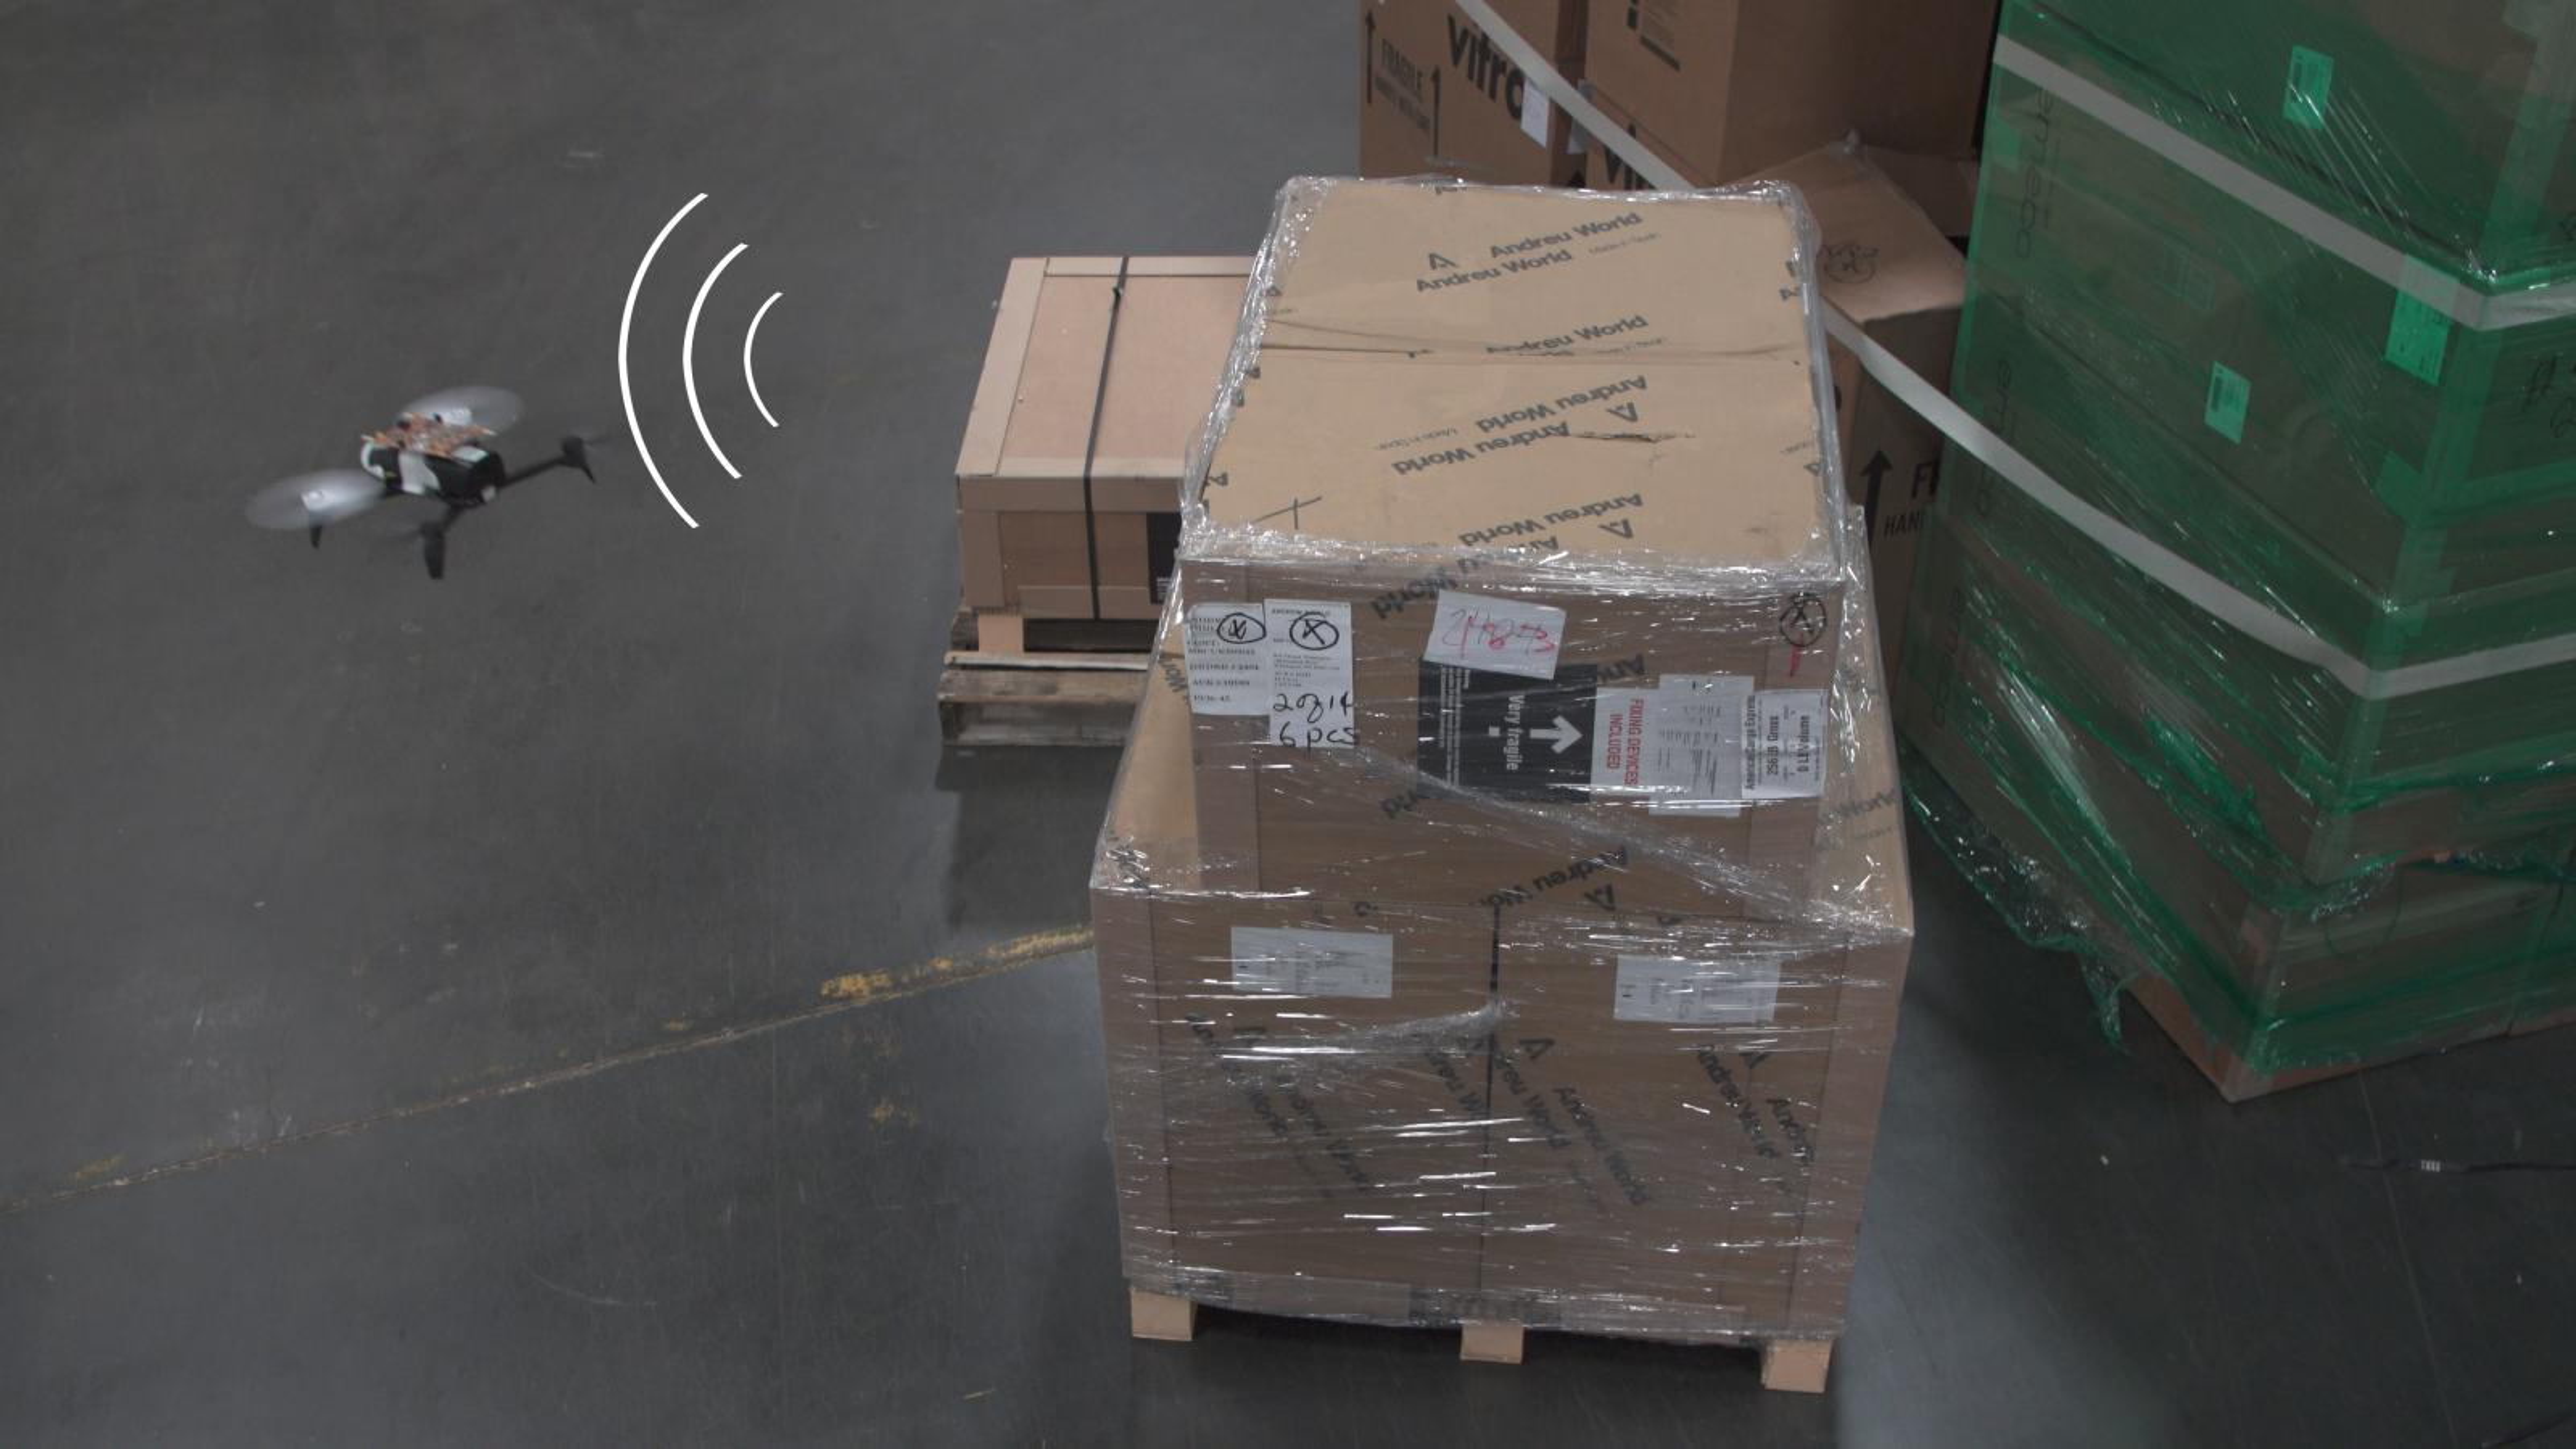 MIT Media Lab scientists prototype drones that improve on